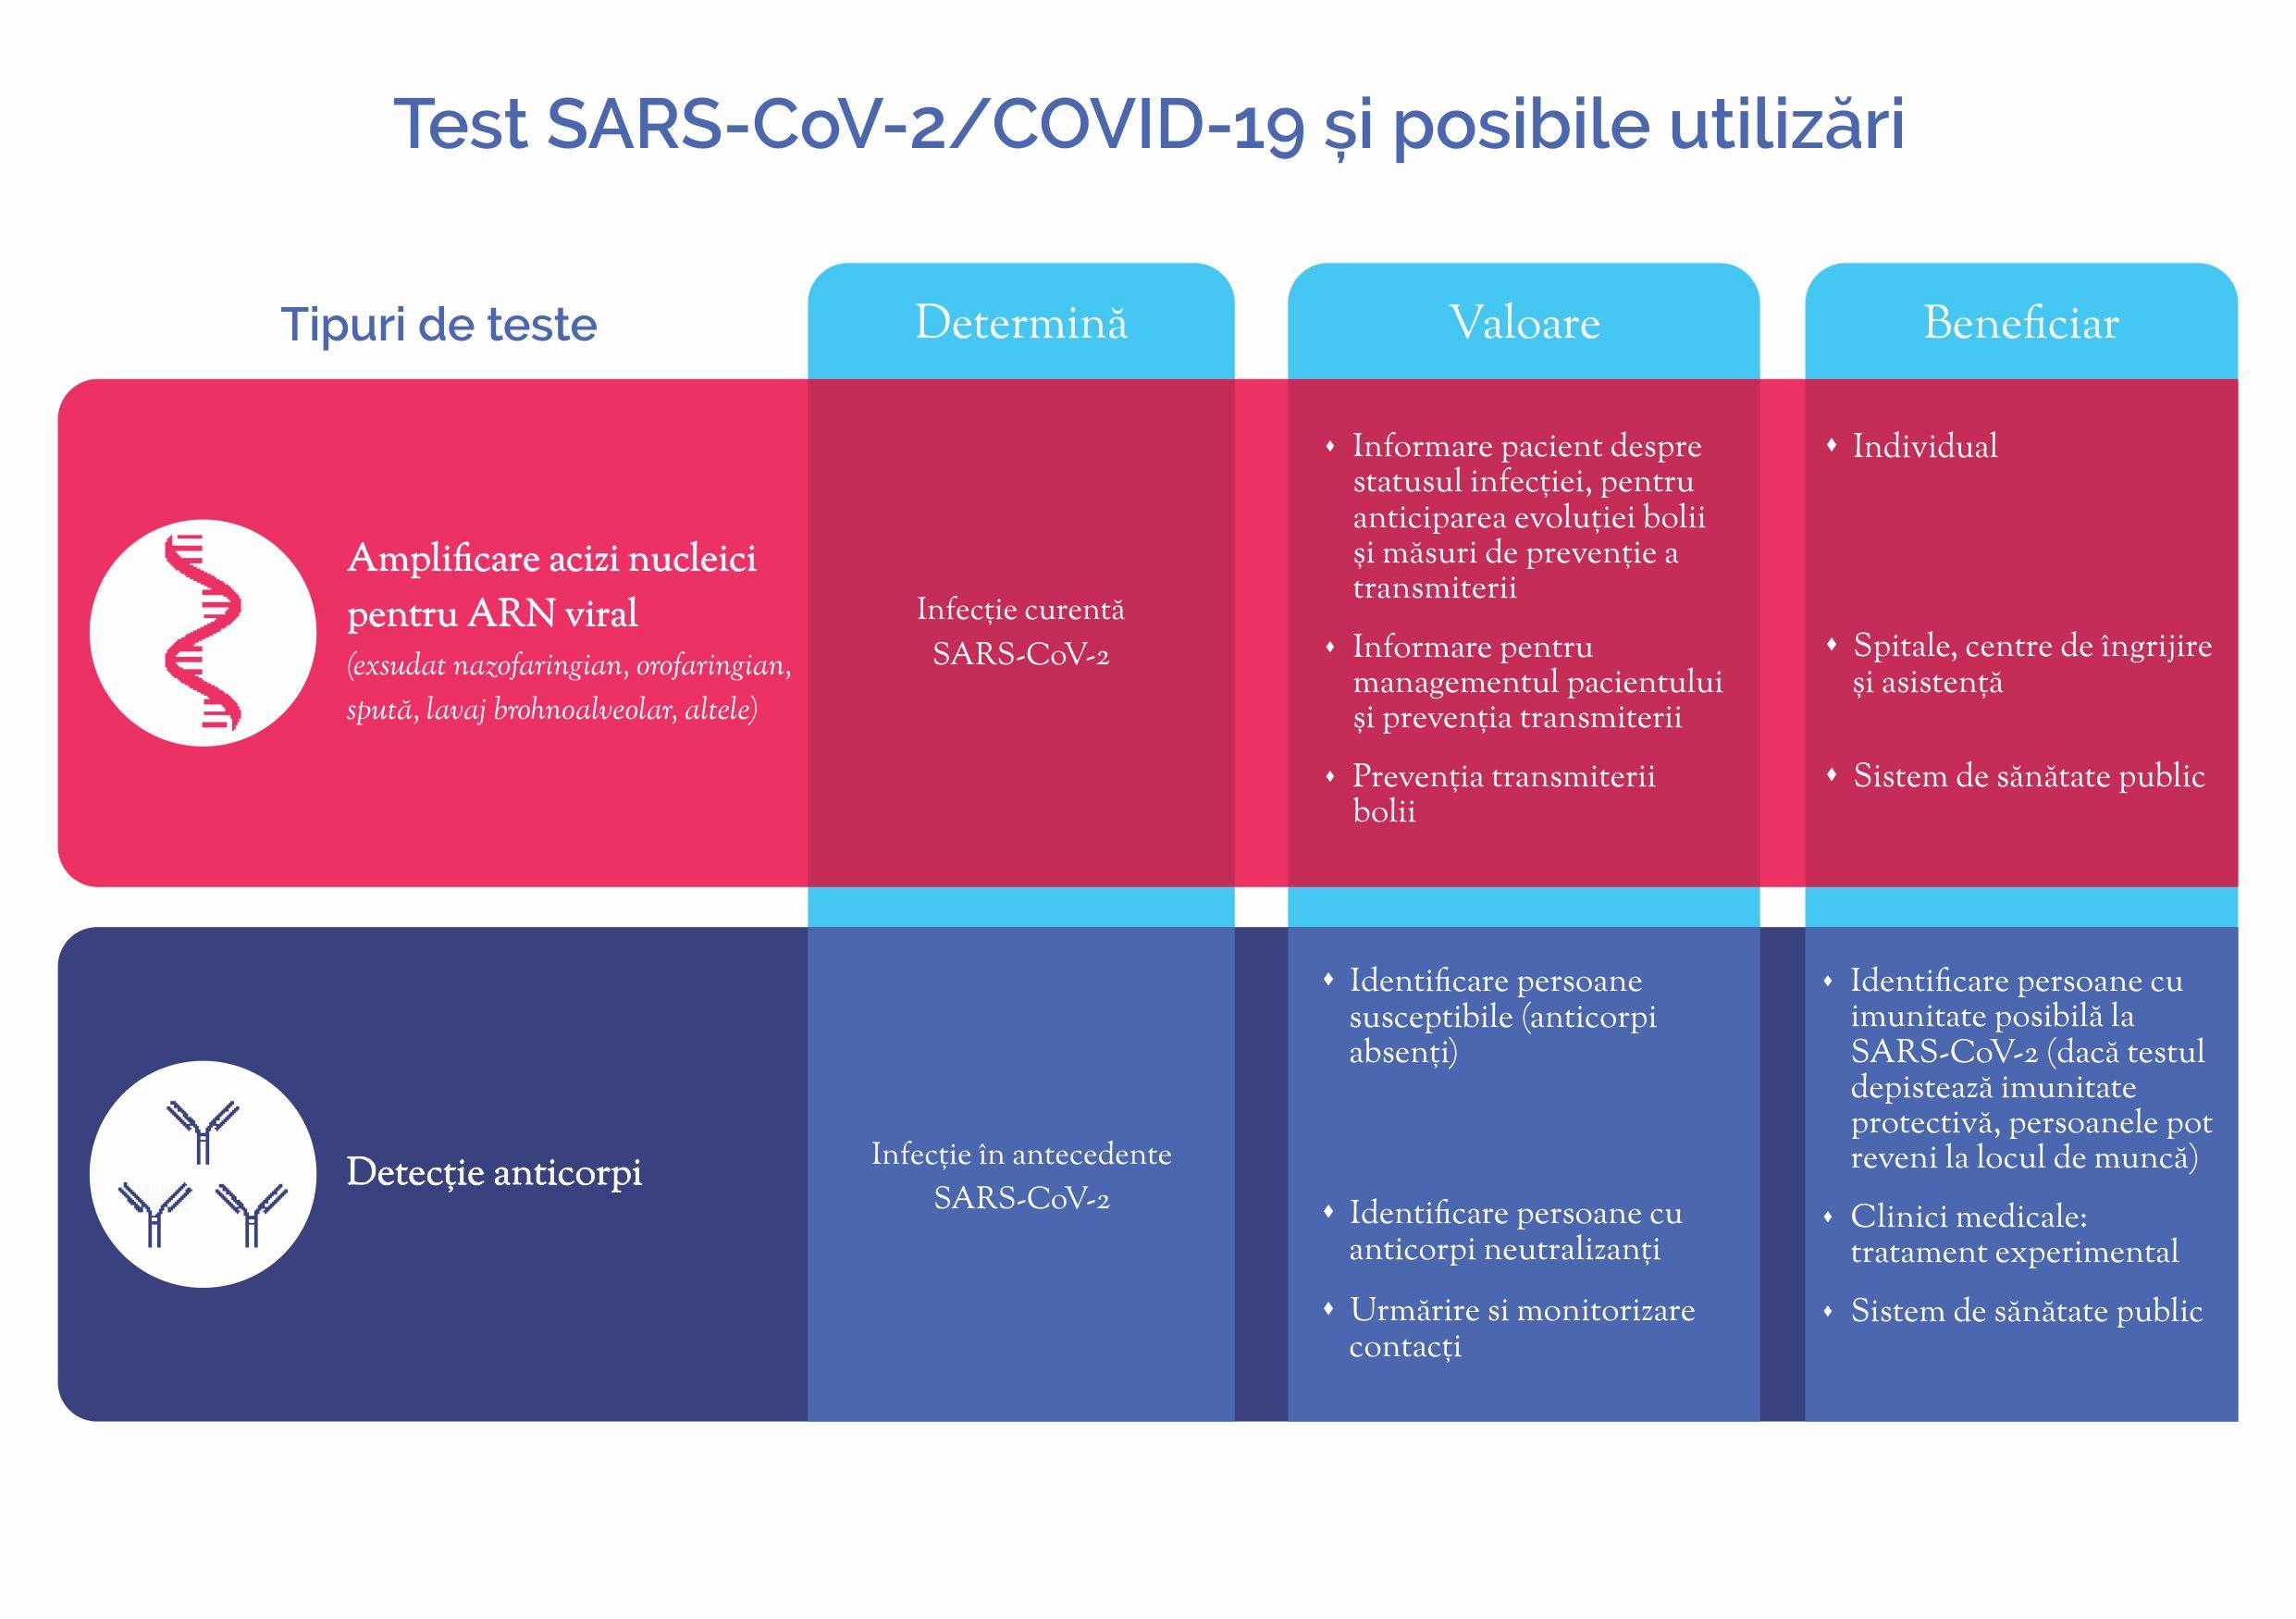 Analize SARS-CoV-2 biologie moleculară